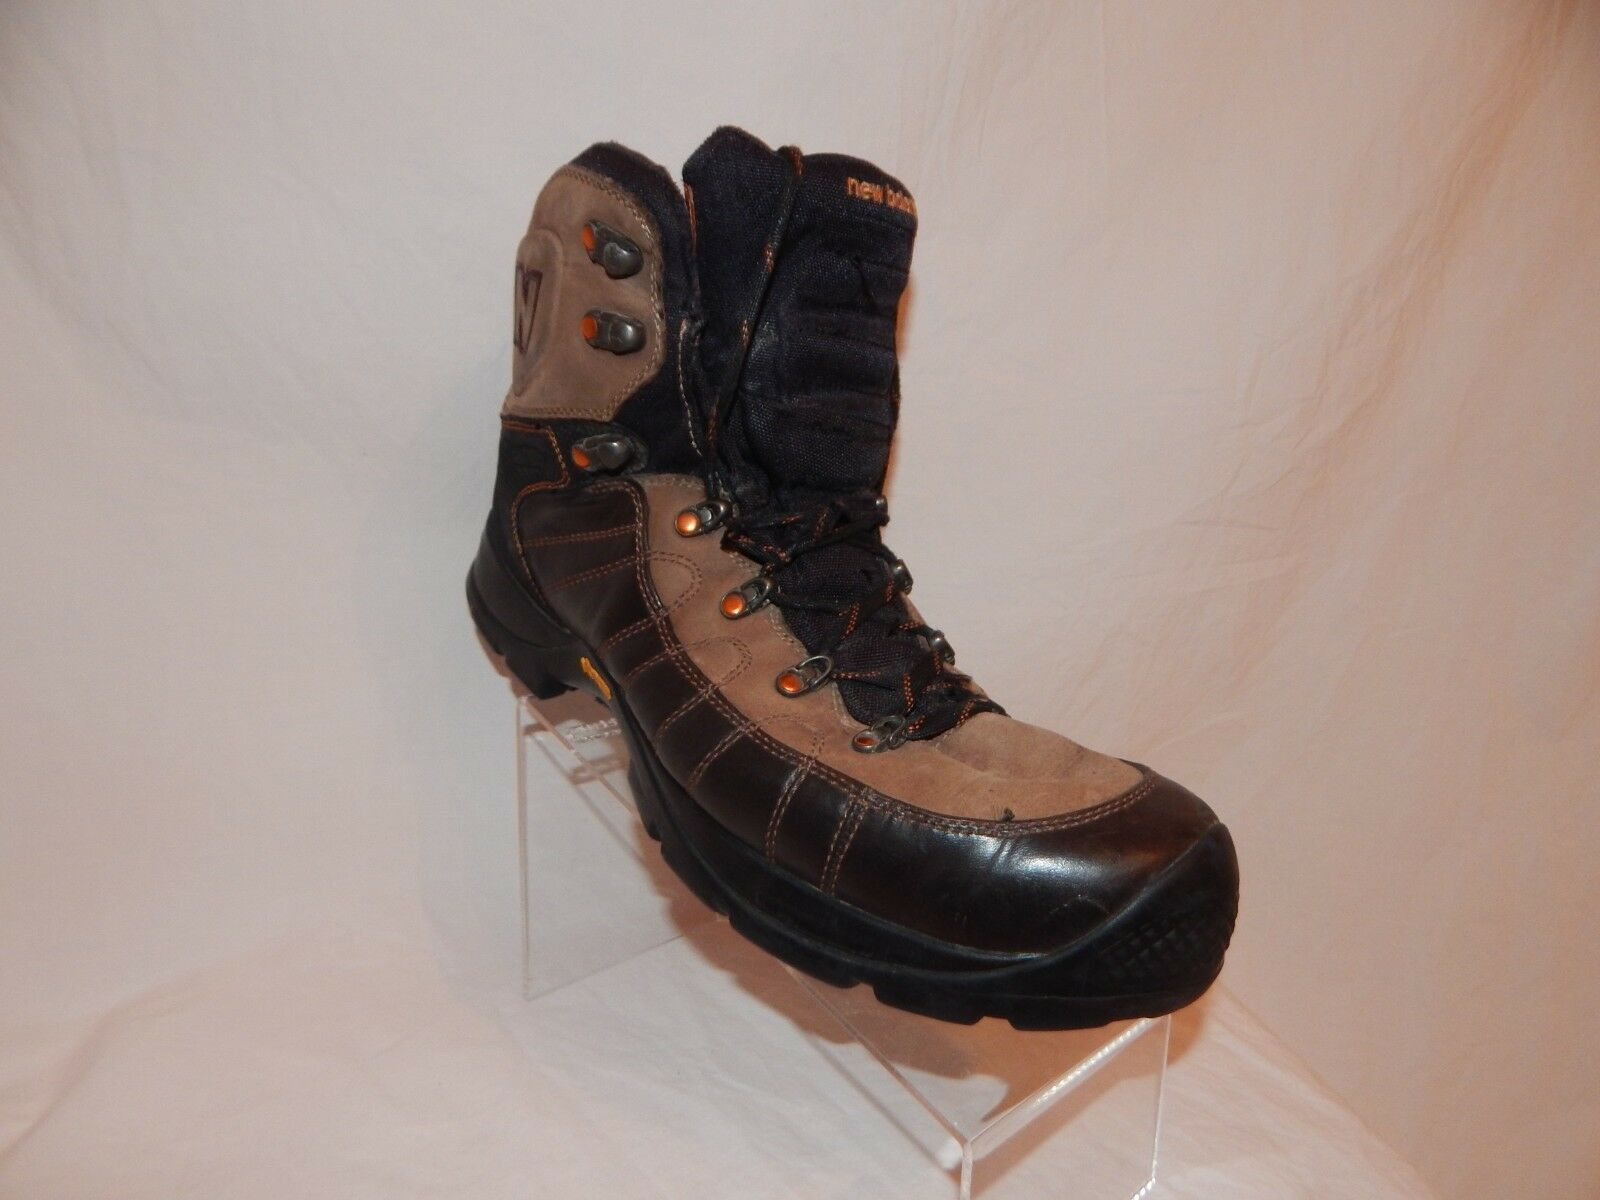 New Balance Rainer MO1500GT Men's Size 14 US Hiking Boots Vibram Gore-Tex Brown